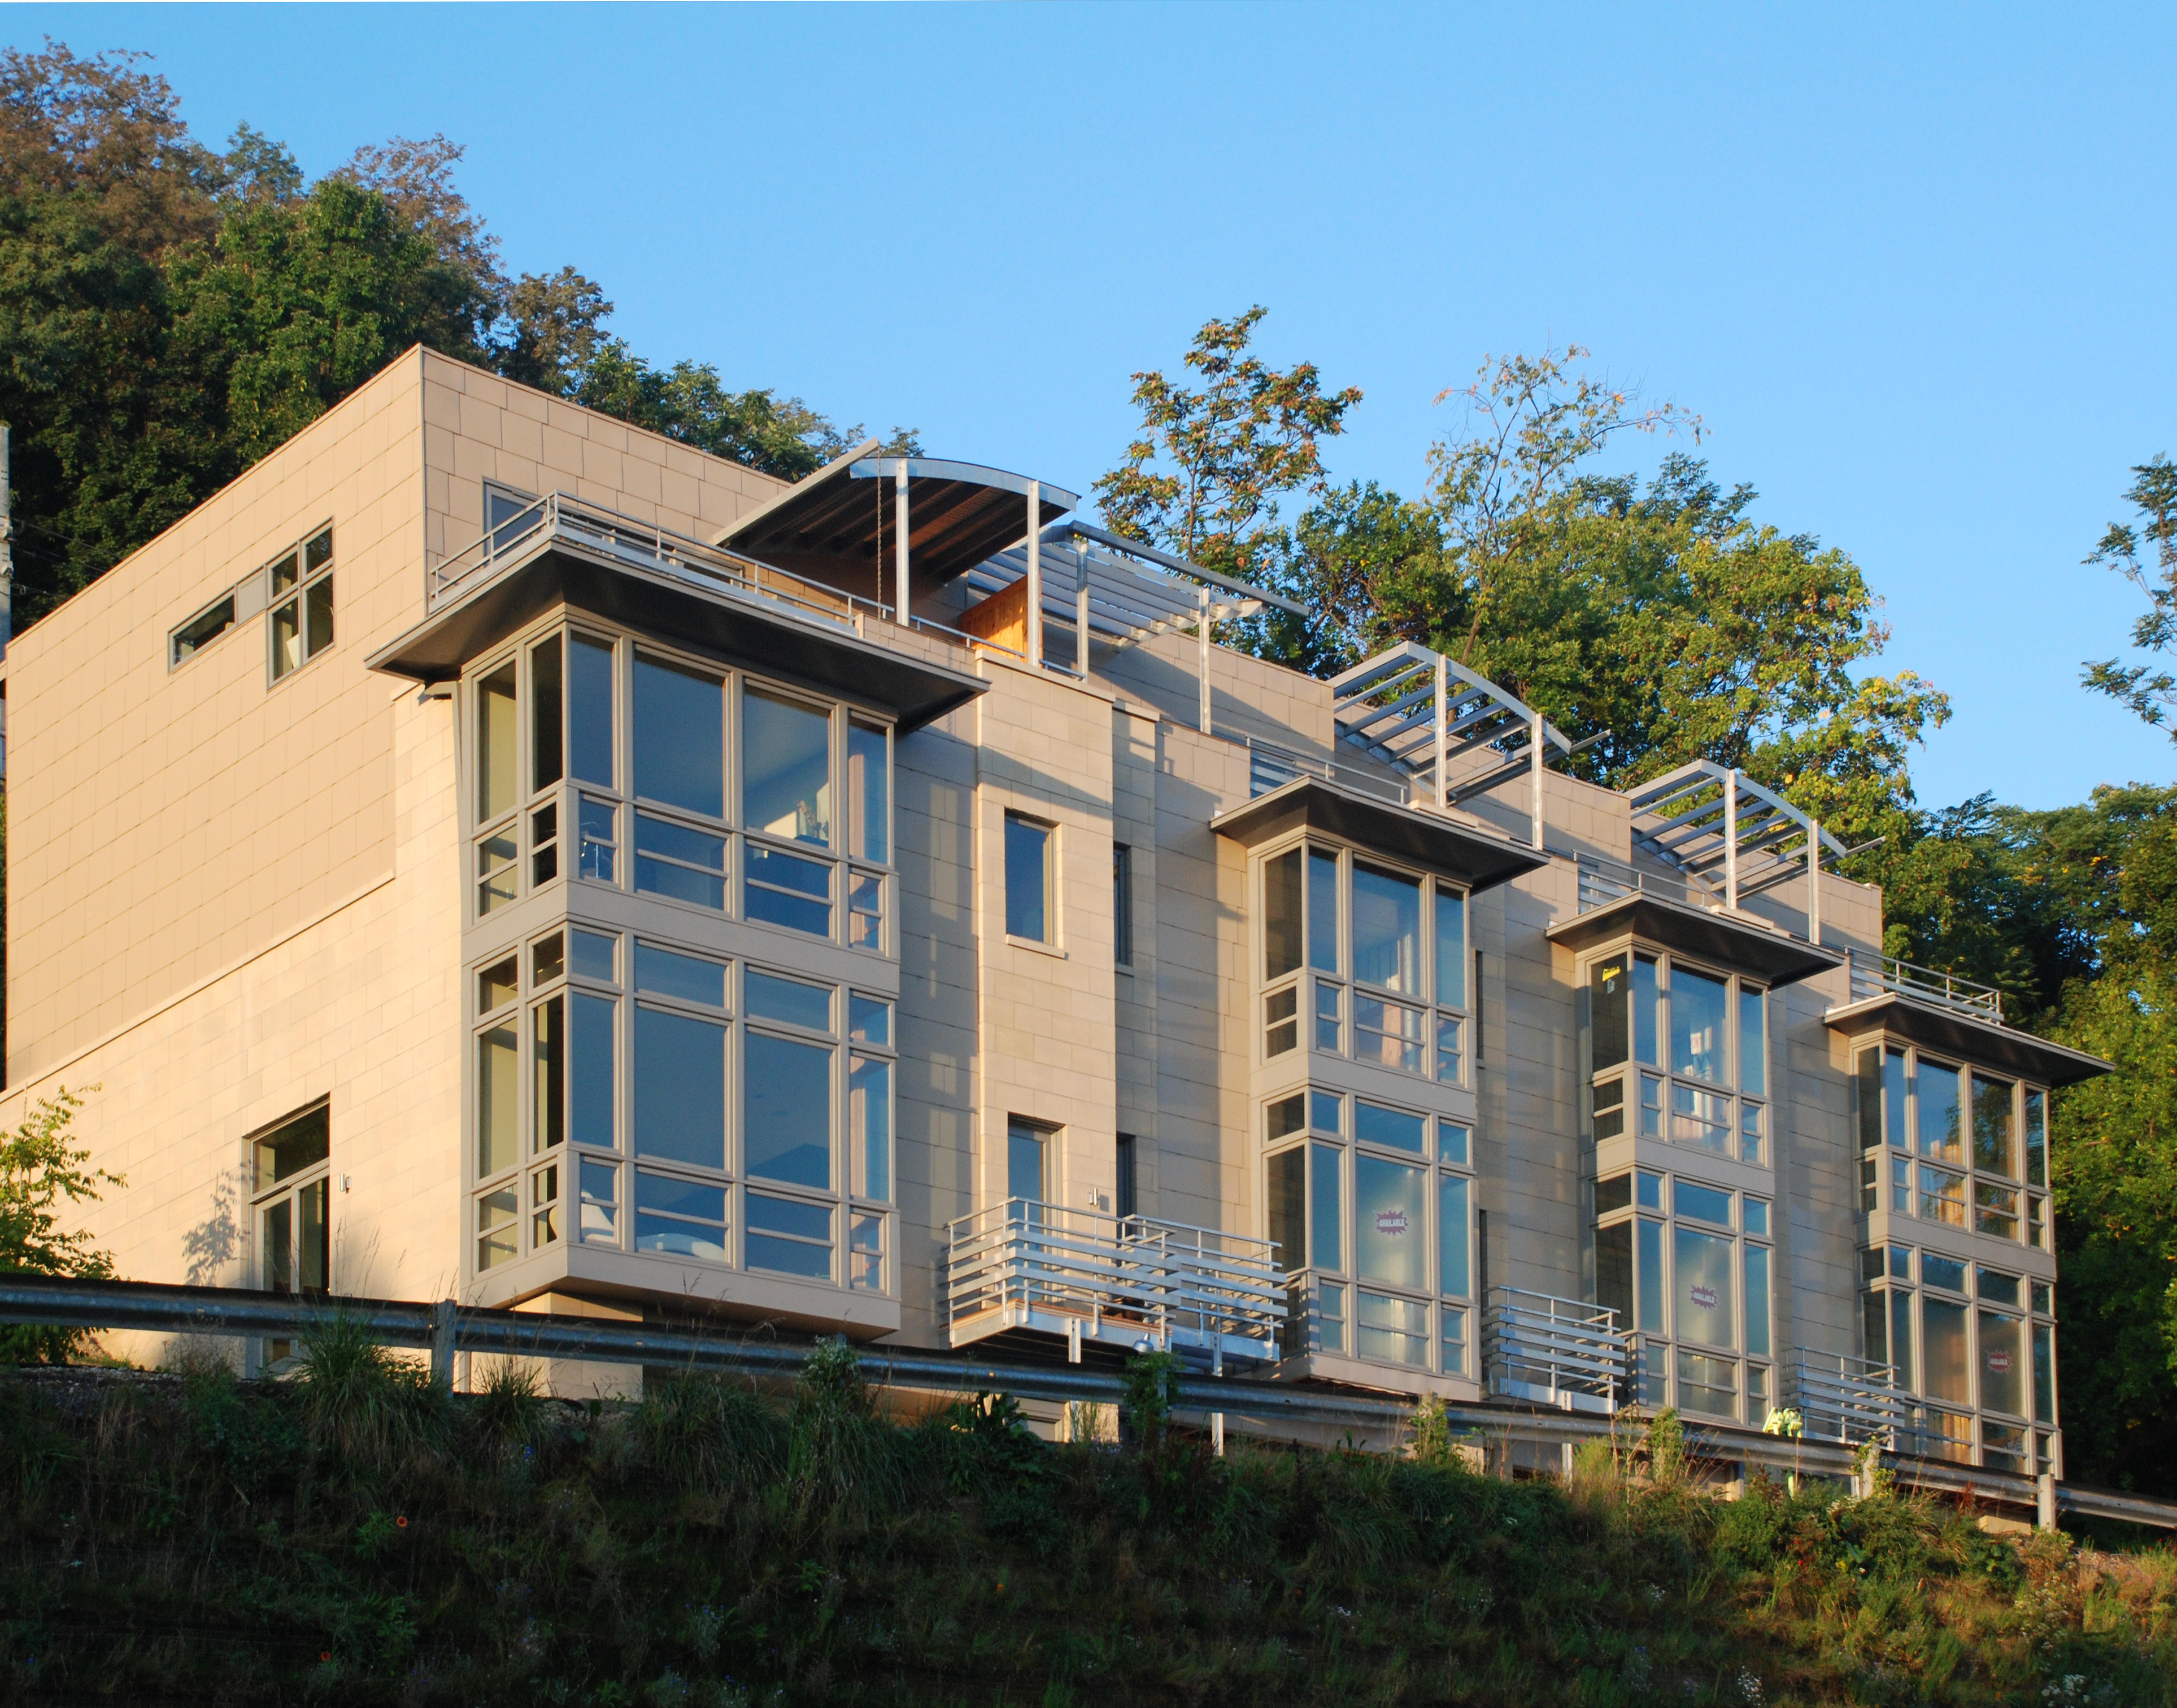 Concrete Building Windom